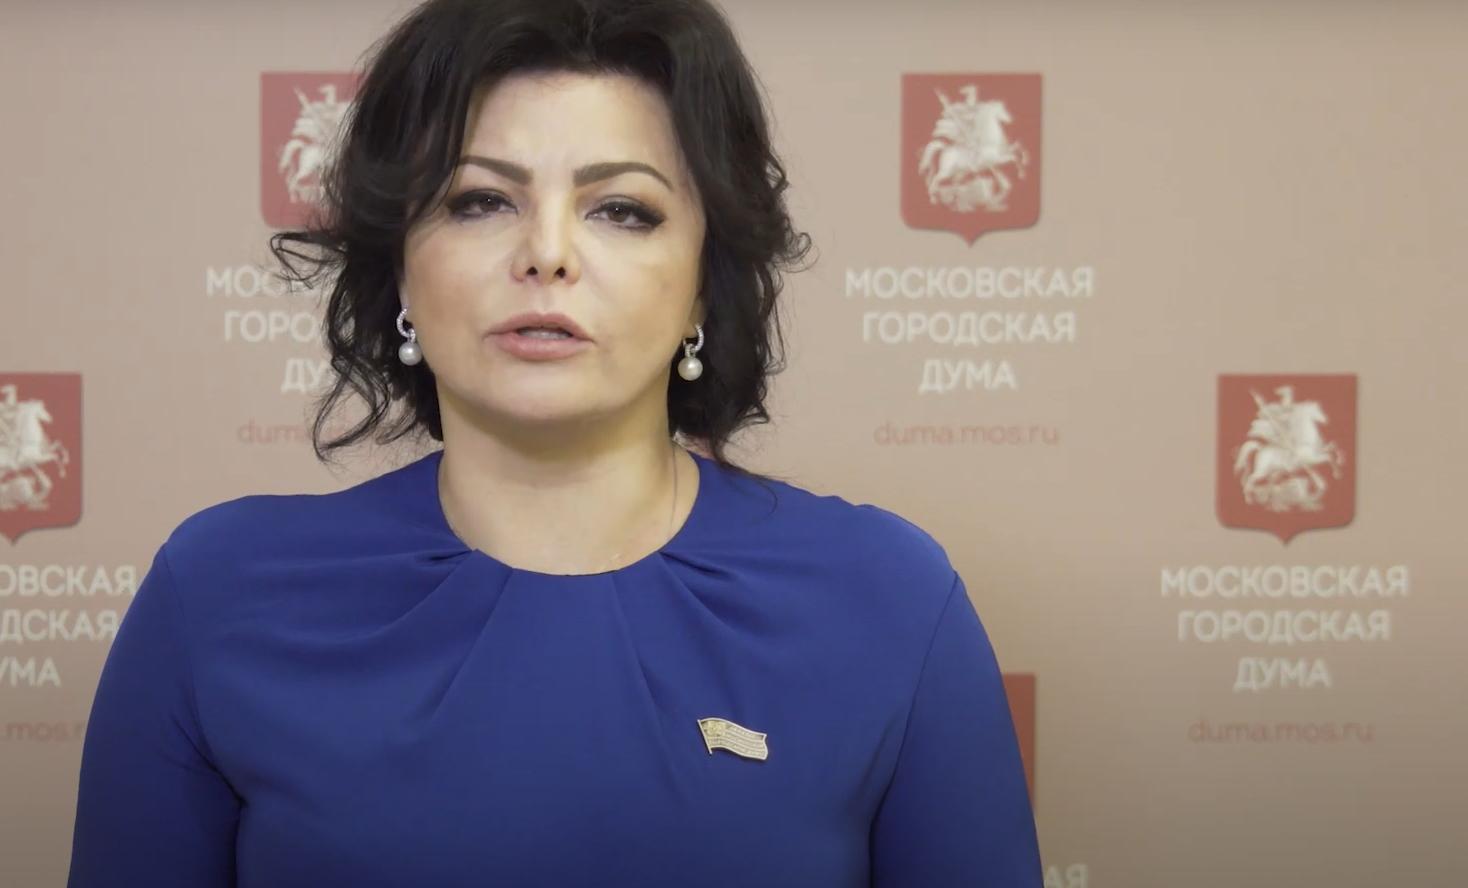 На фото депутат МГД Елена Николаева